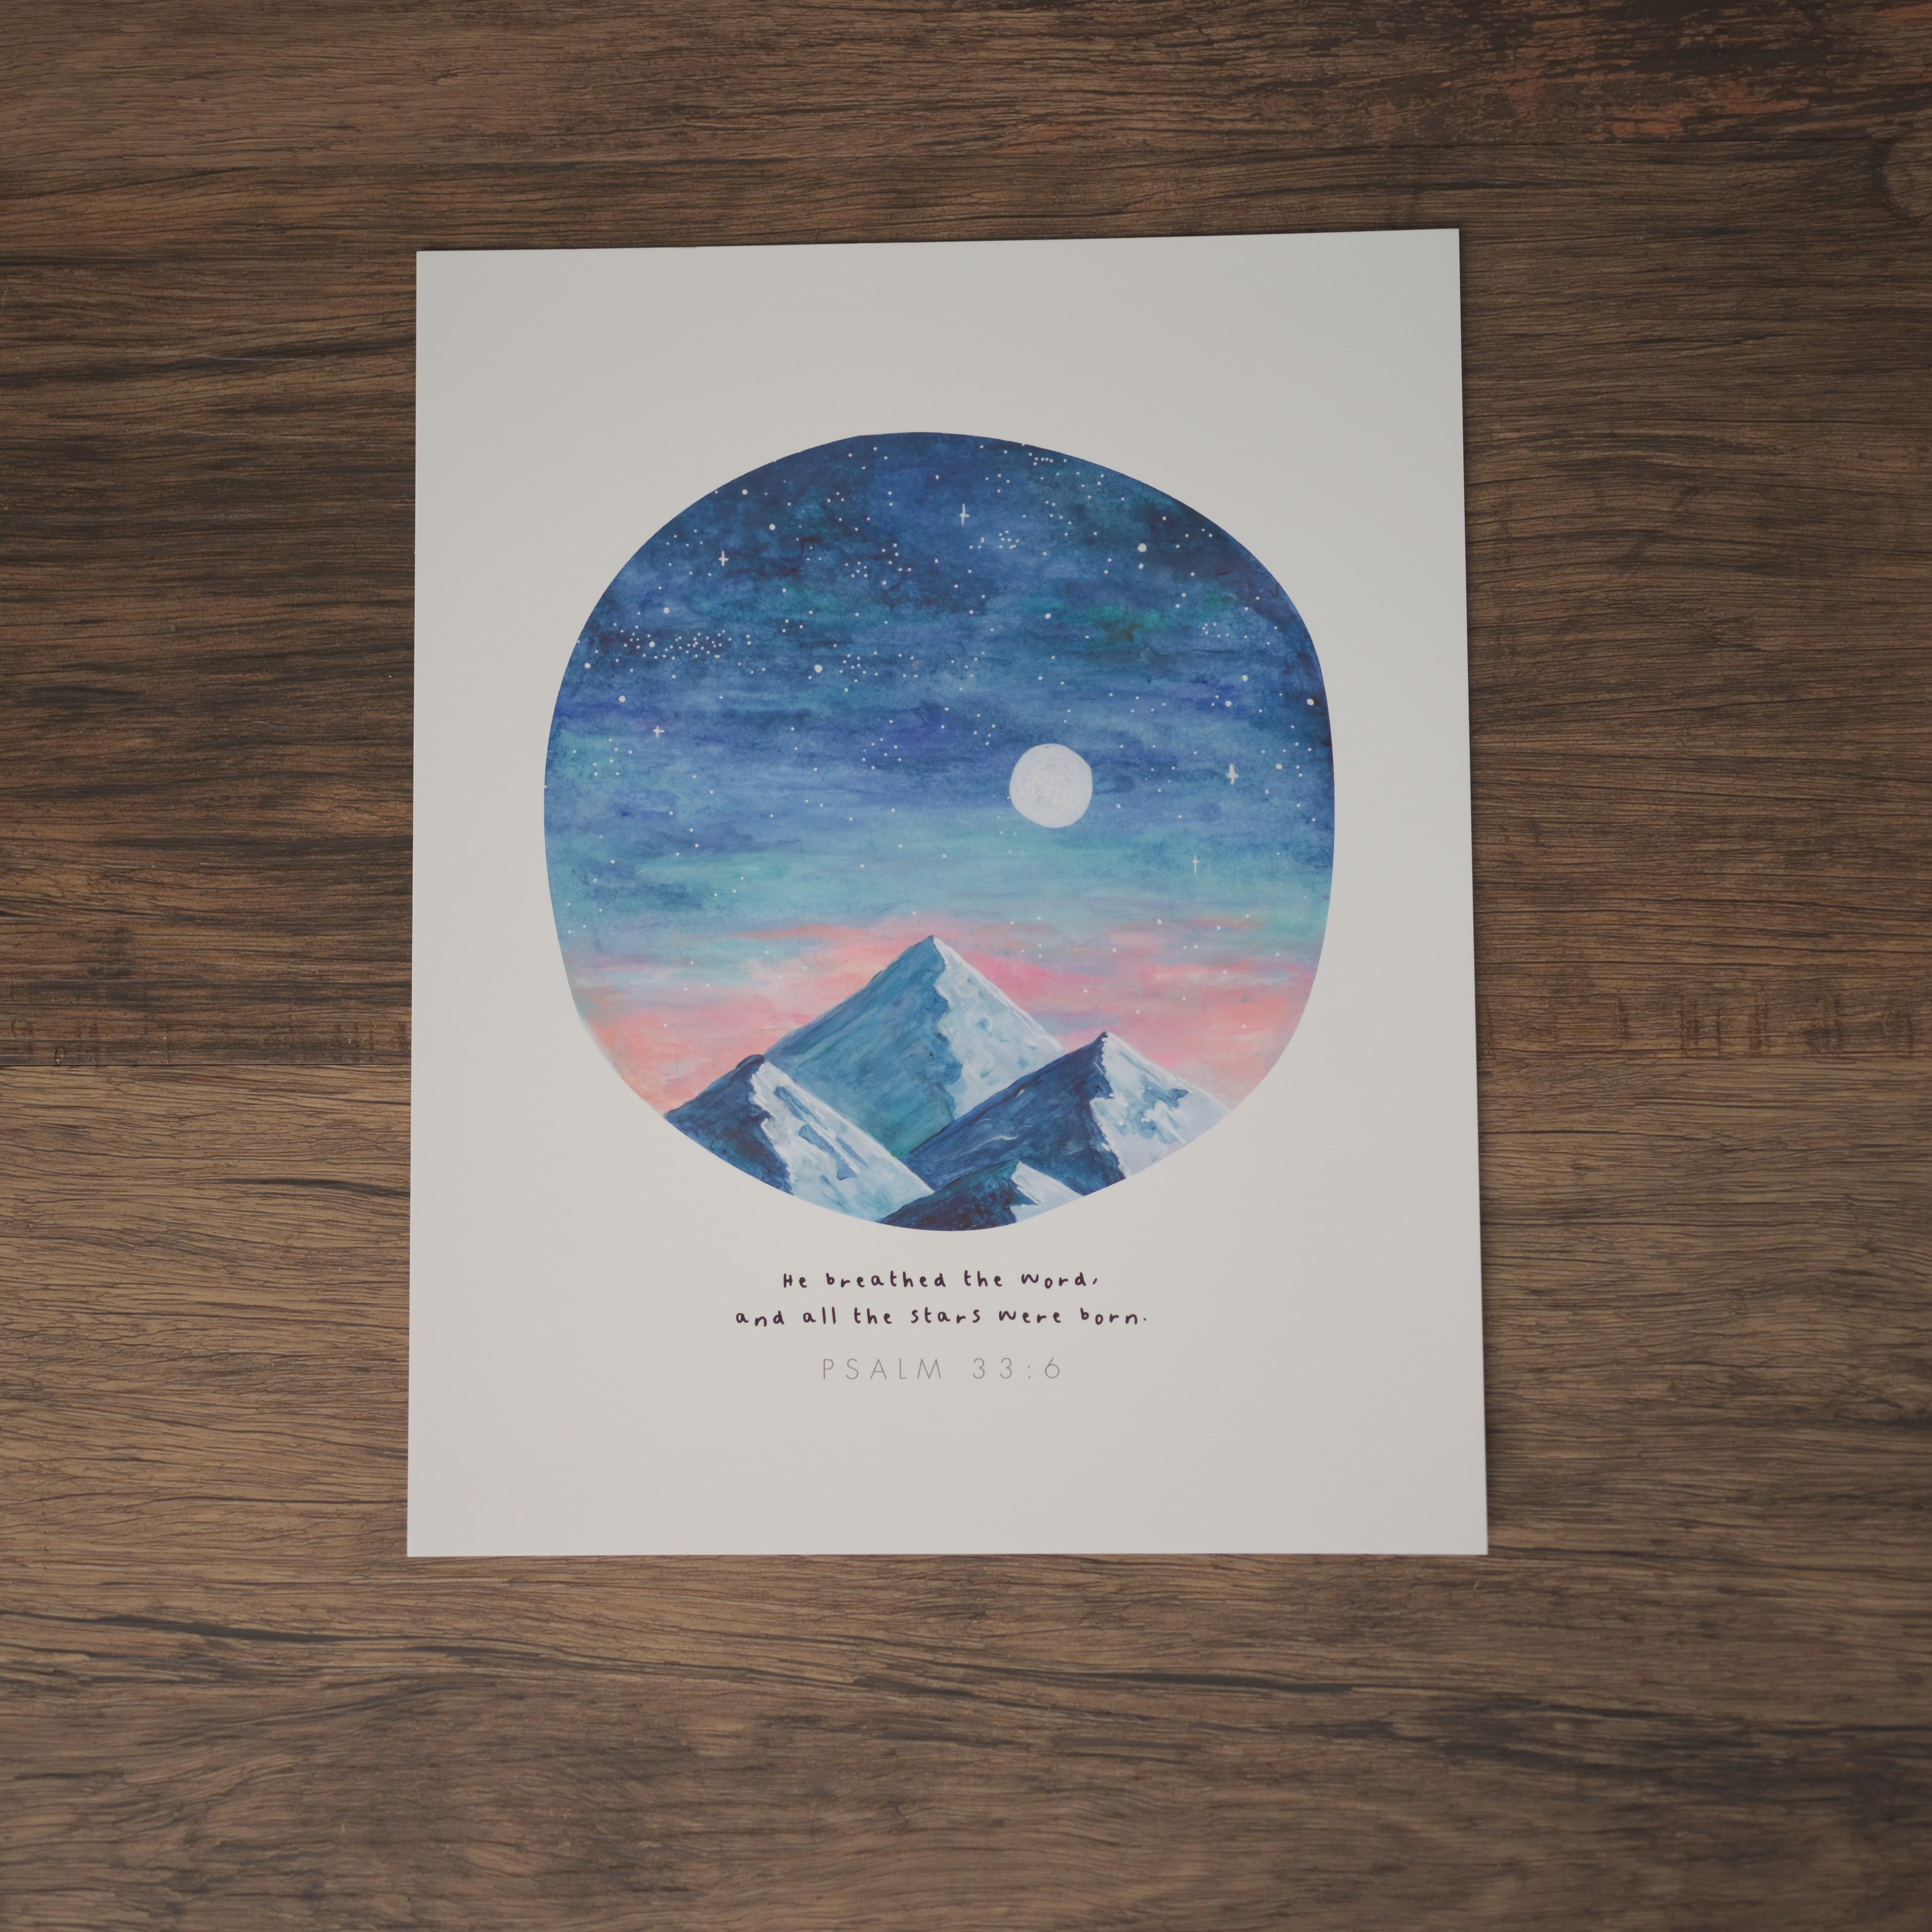 Ooh I Like That Design Small Prints